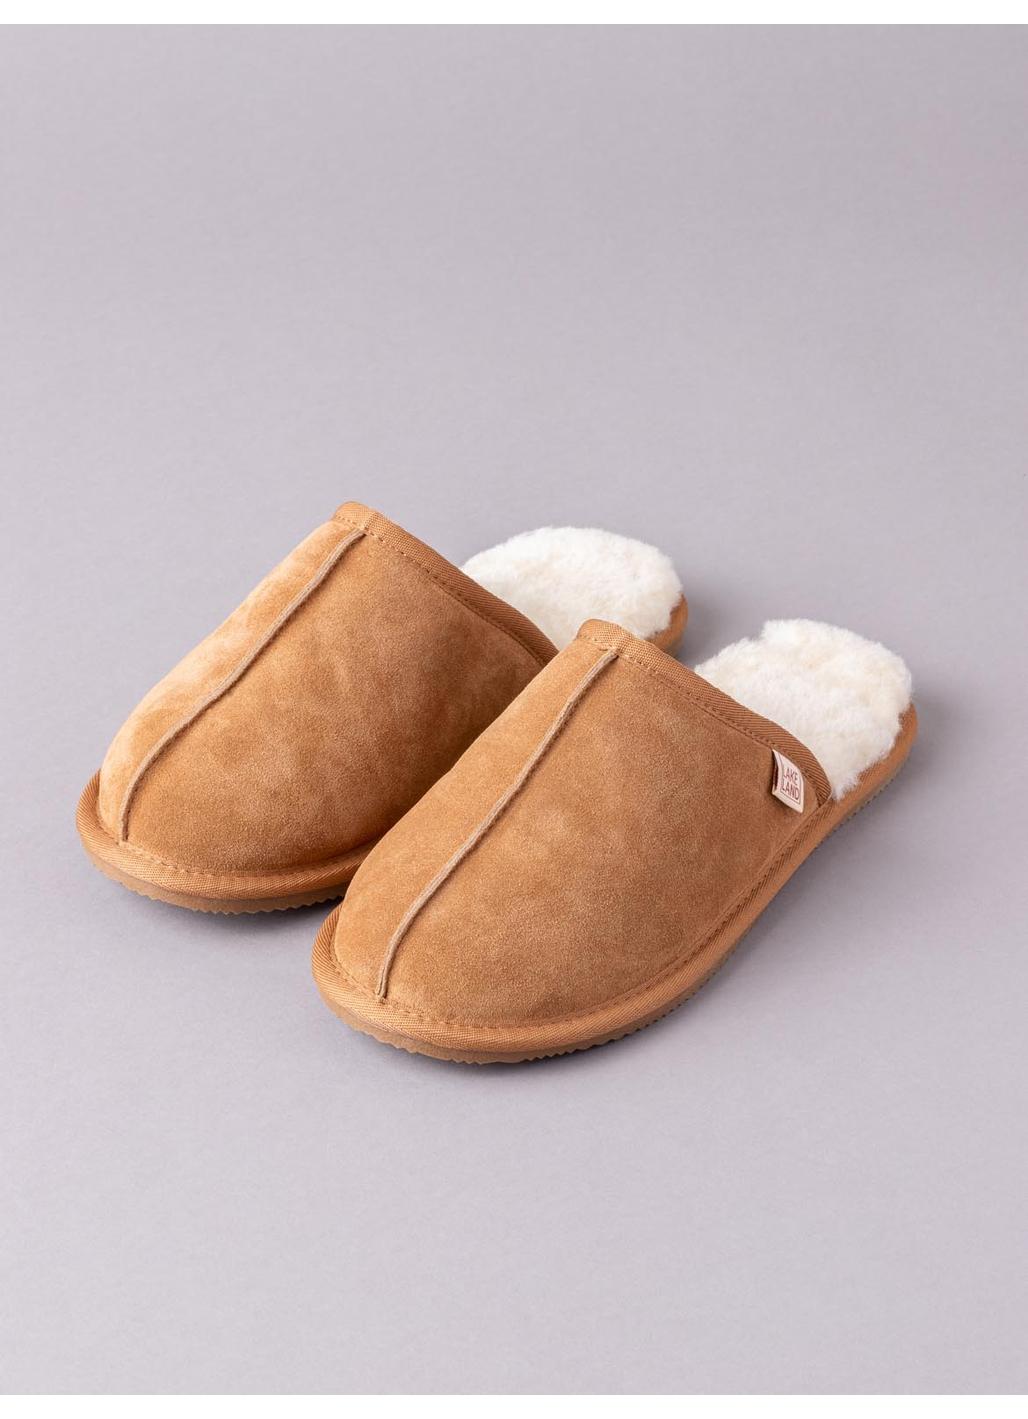 Men's Sheepskin Sliders in Tan